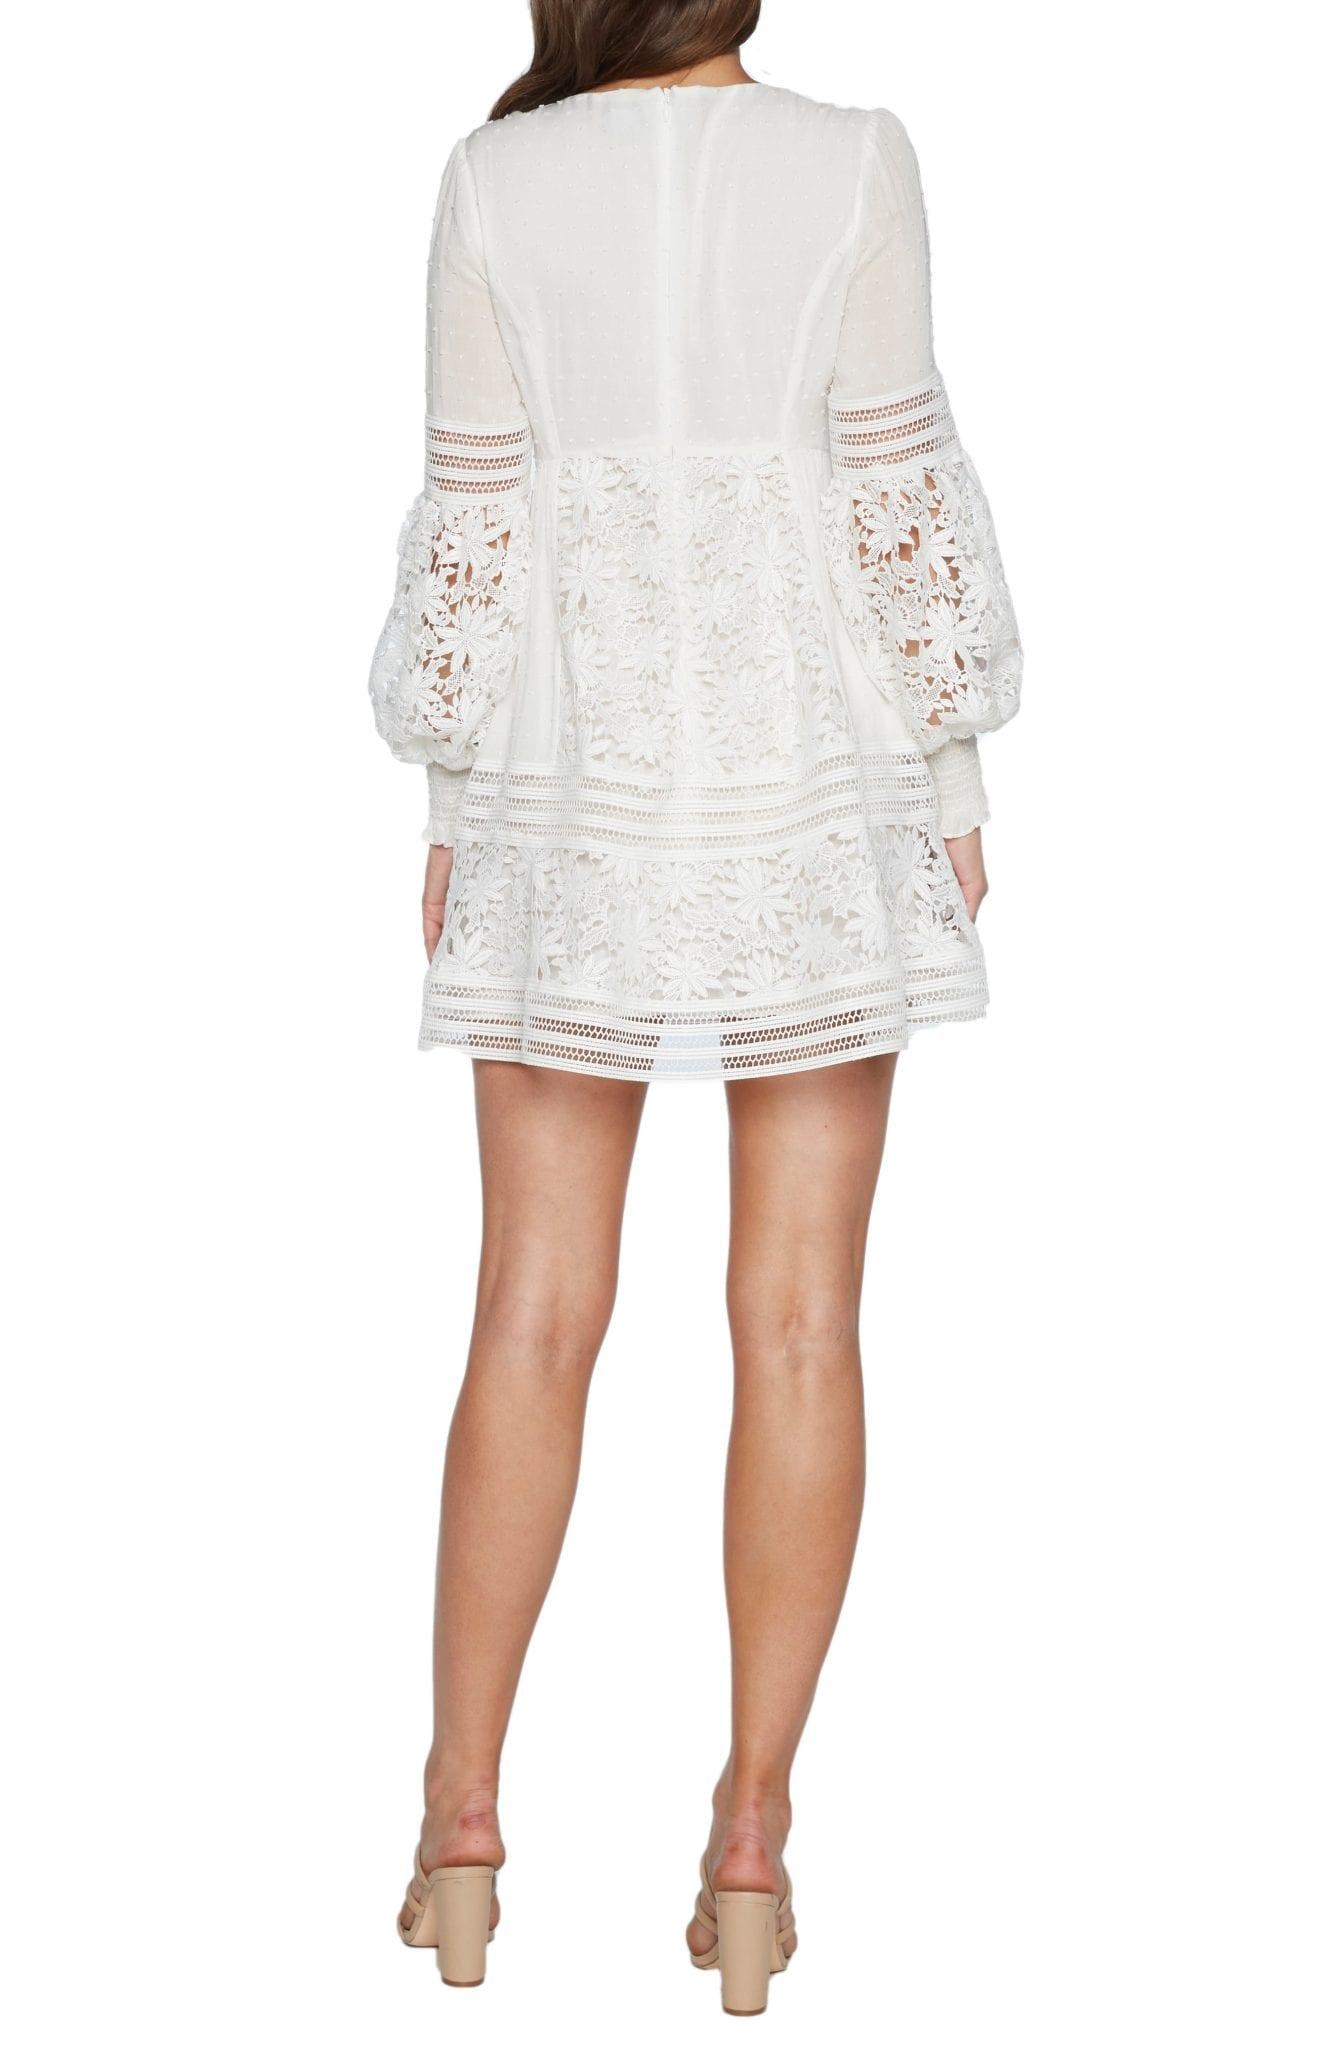 BARDOT Mariah Long Sleeve Swiss Dot & Lace Babydoll Dress